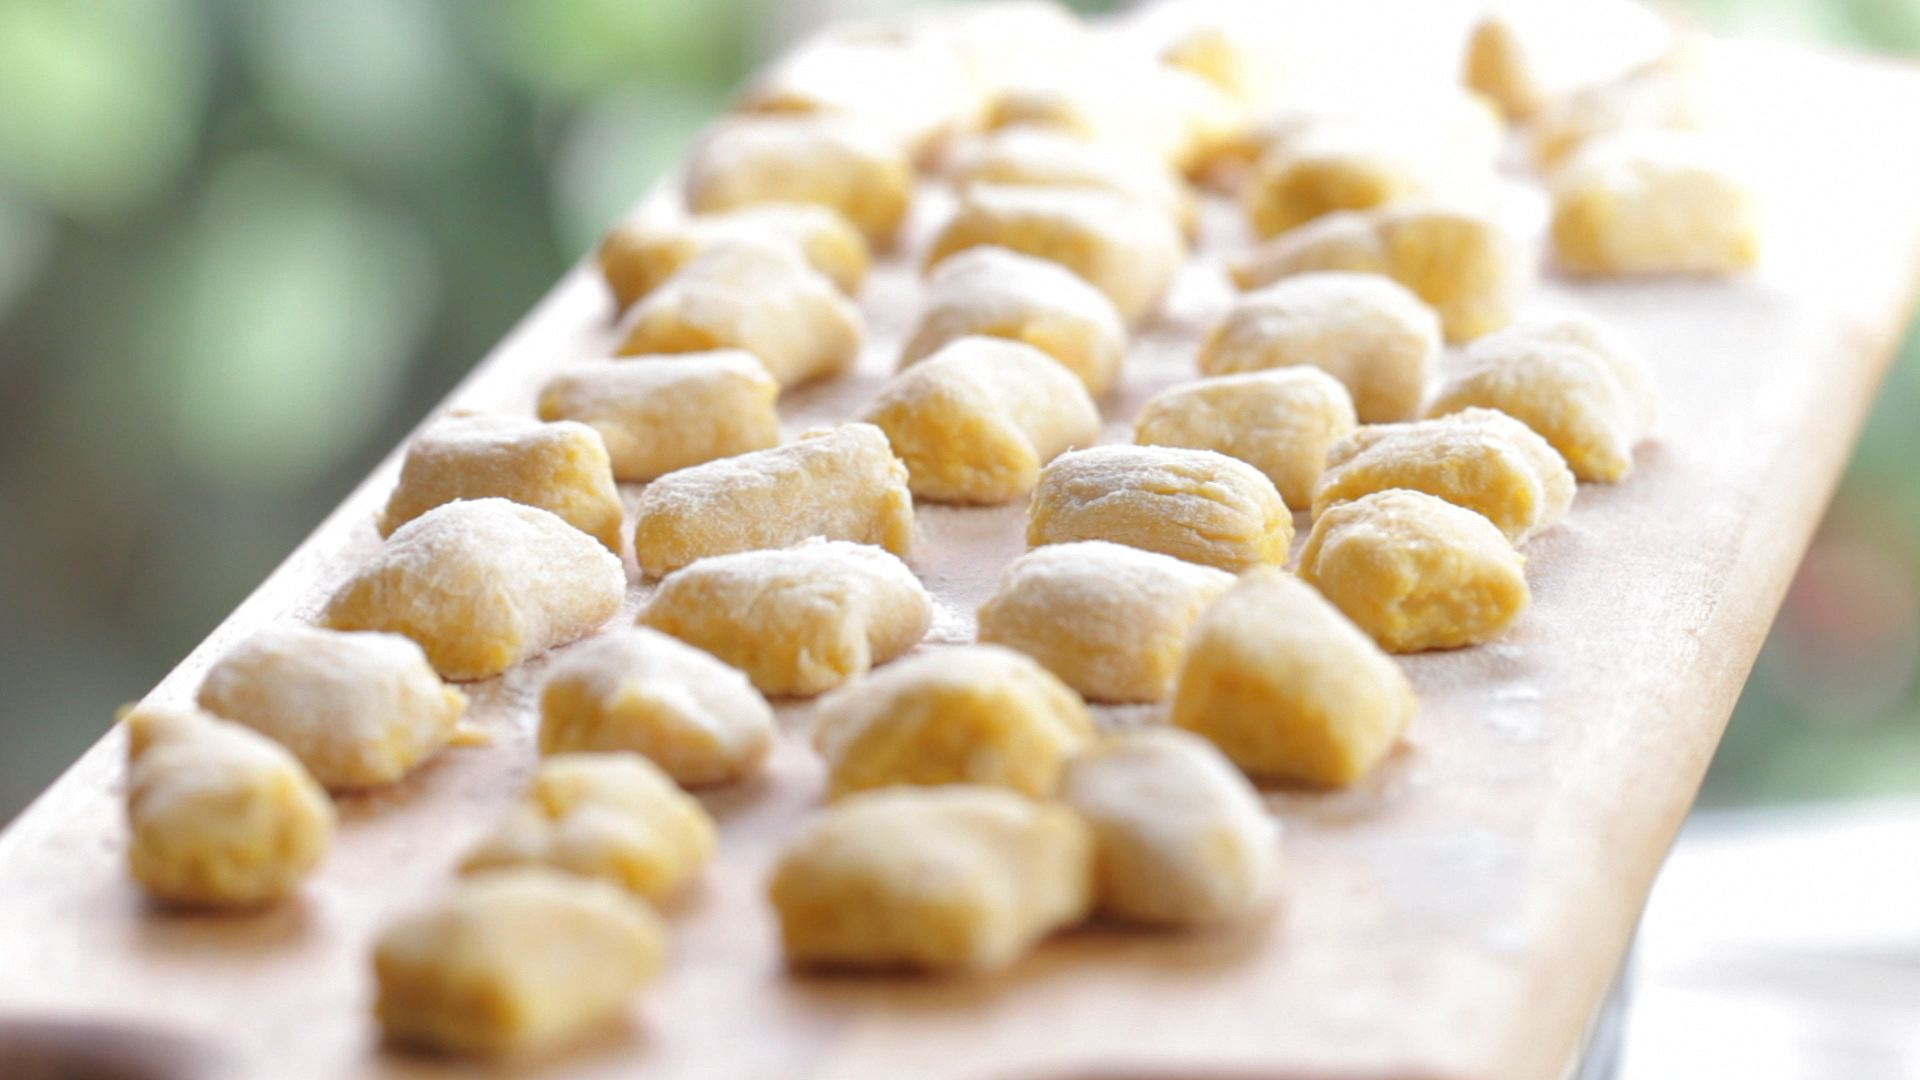 pumkin gnocchi with gorgonzola sauce | Buona Pappa